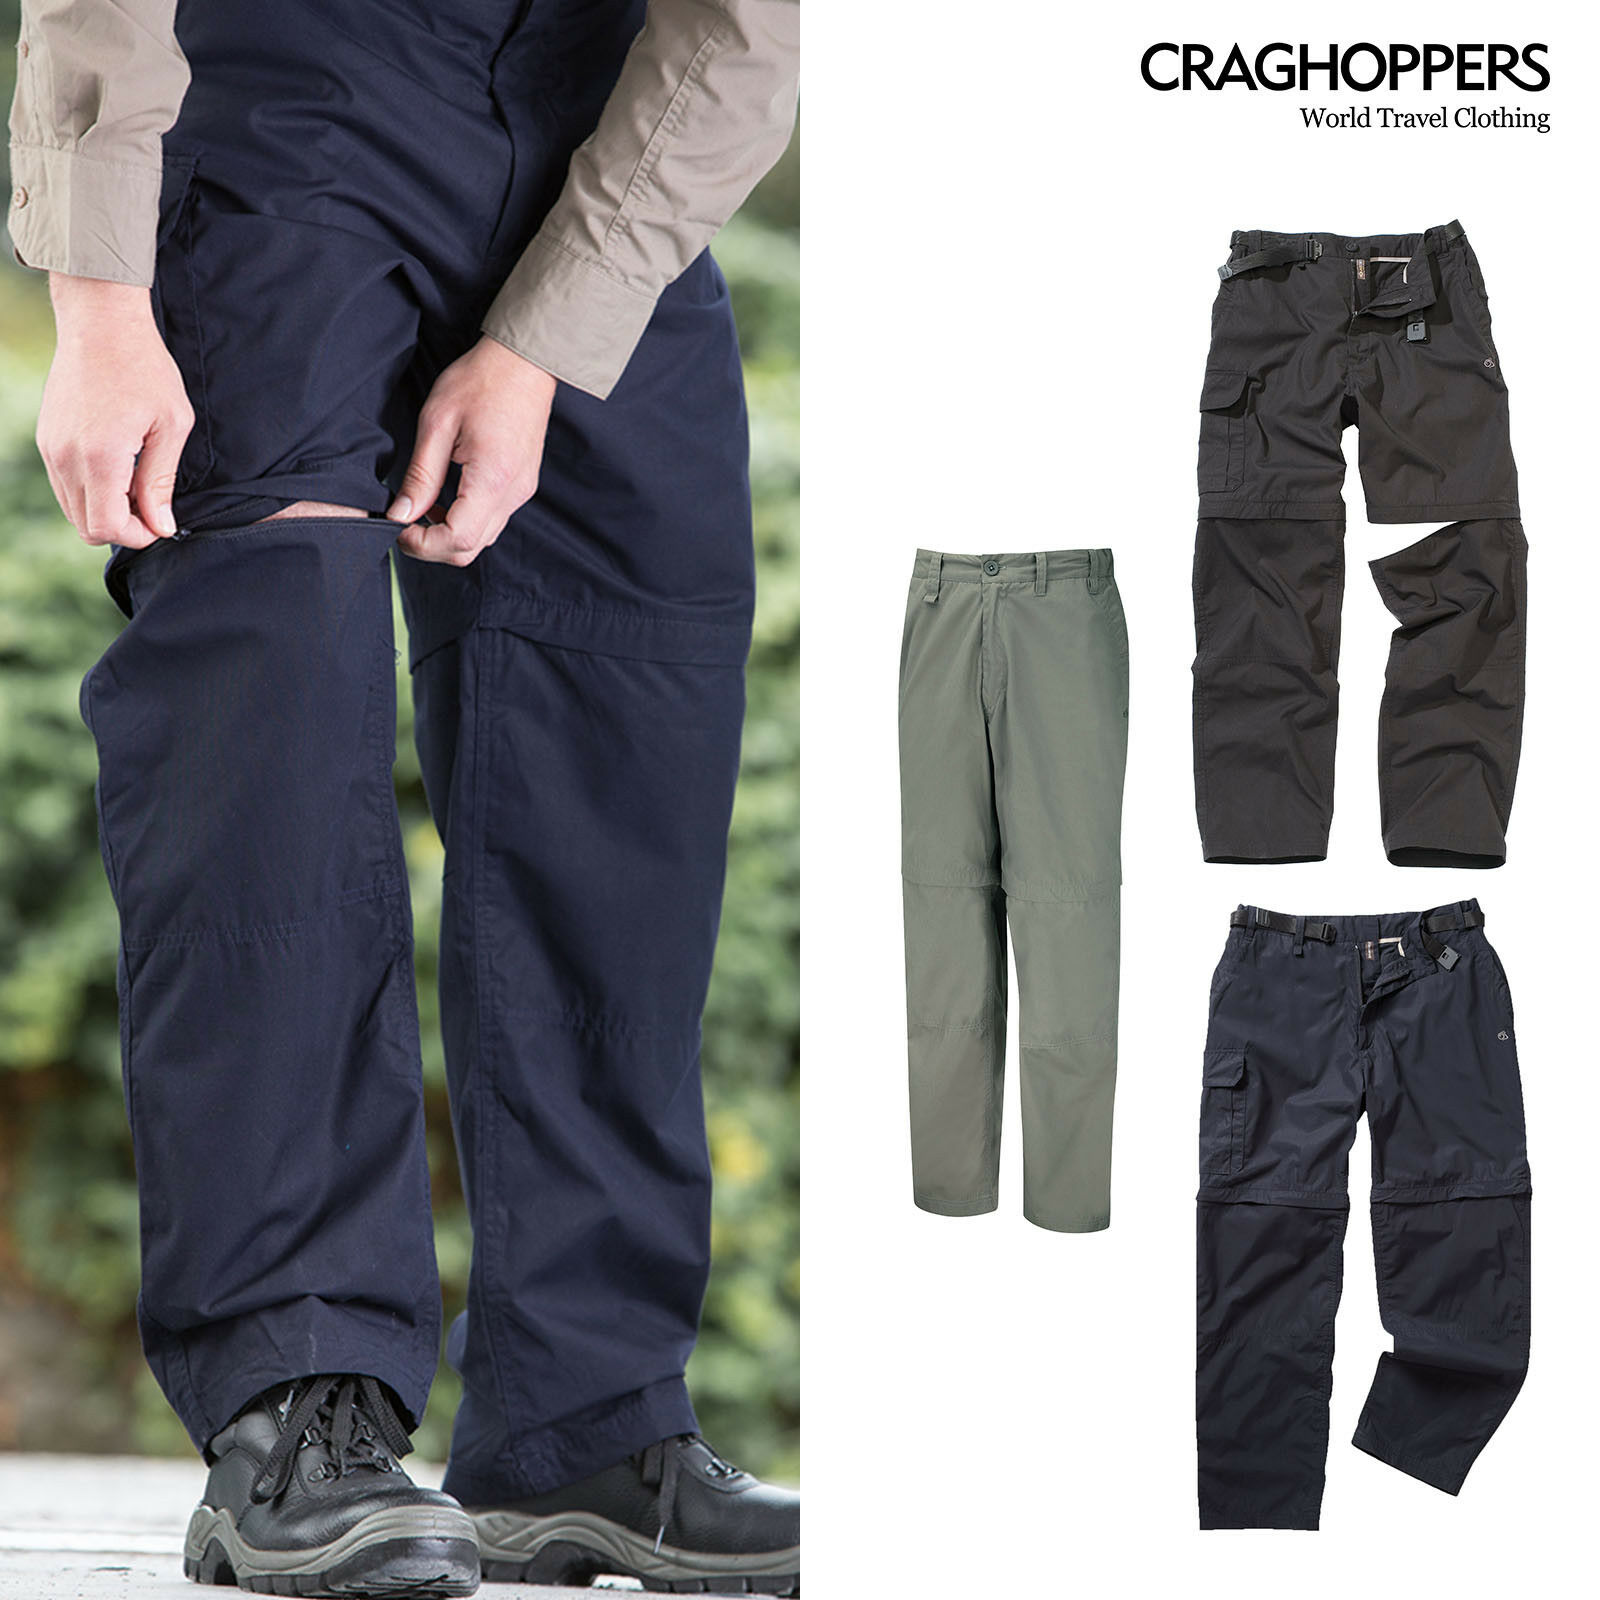 Craghoppers Kiwi ConGrünible Trousers (CMJ107) - Water-repellent Trousers Shorts